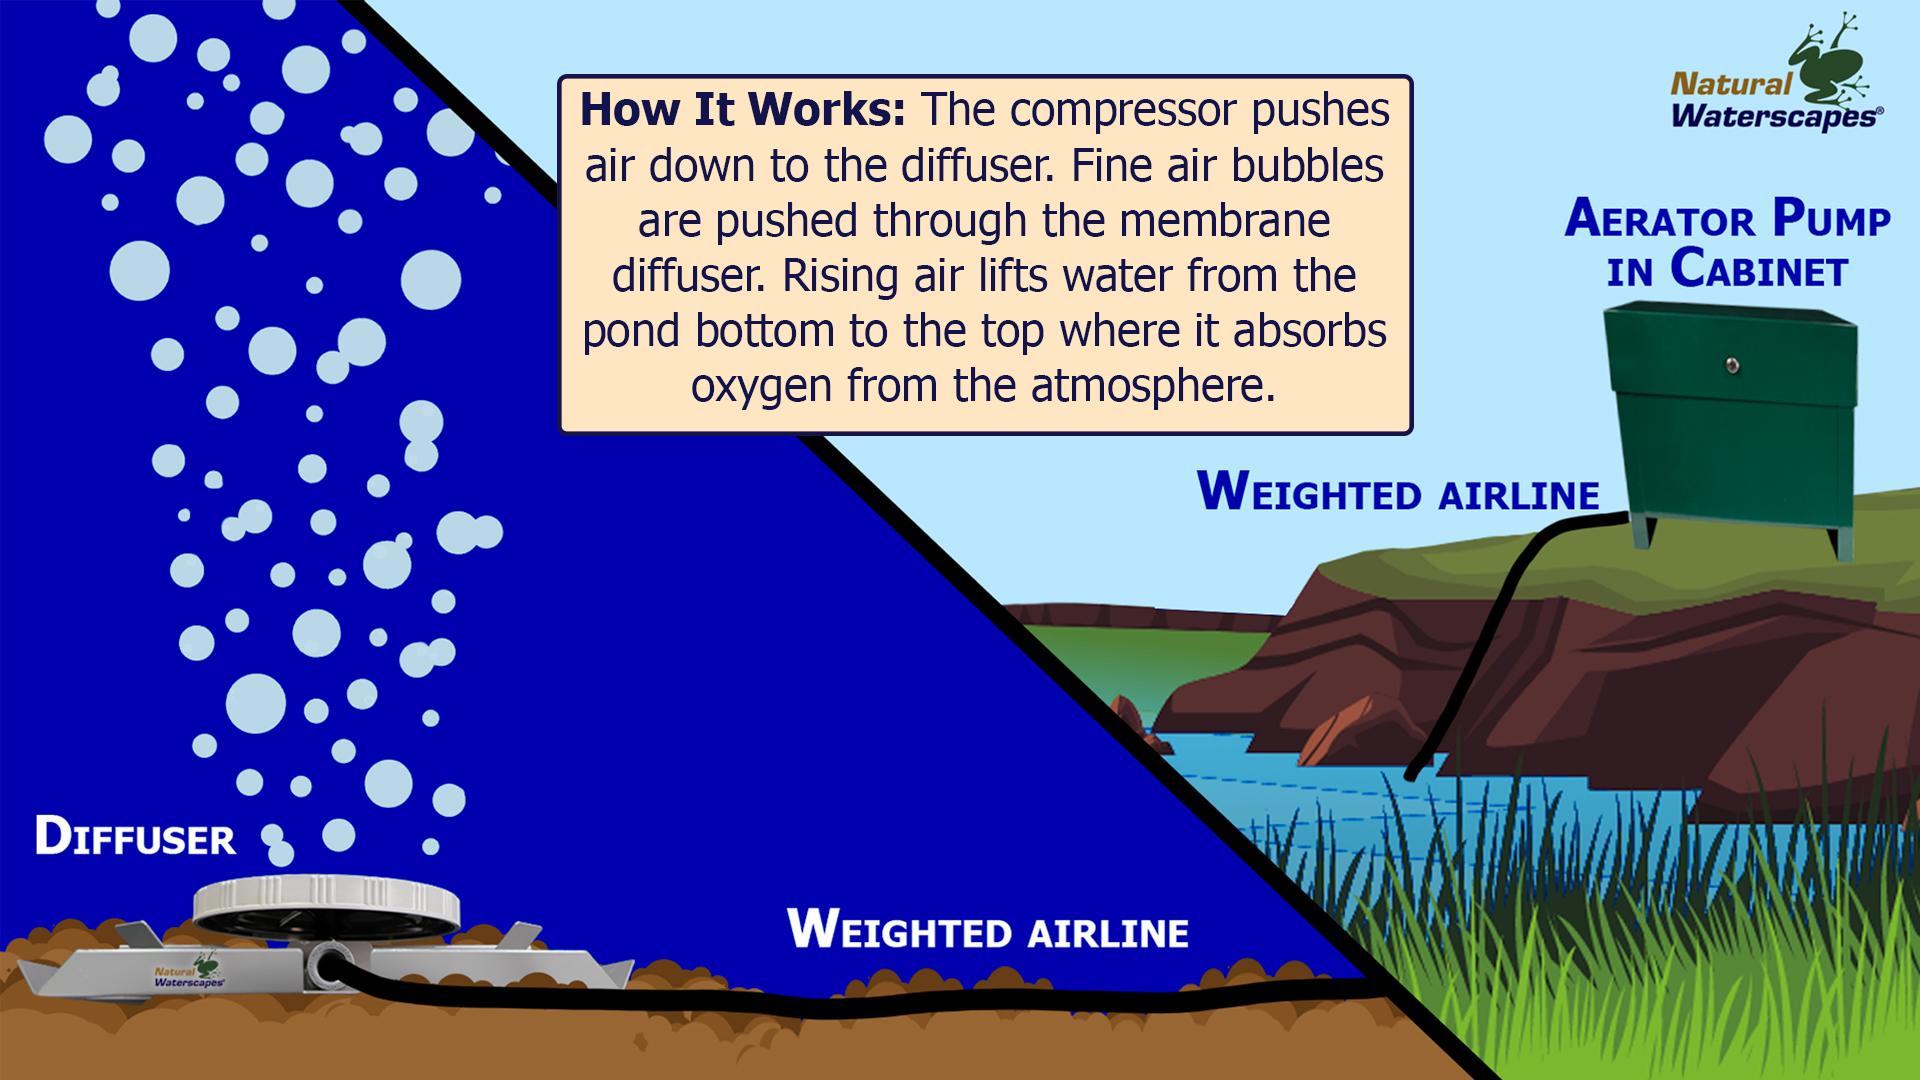 powerair-aeration-pond-aerator-graphic-how-it-works.jpg